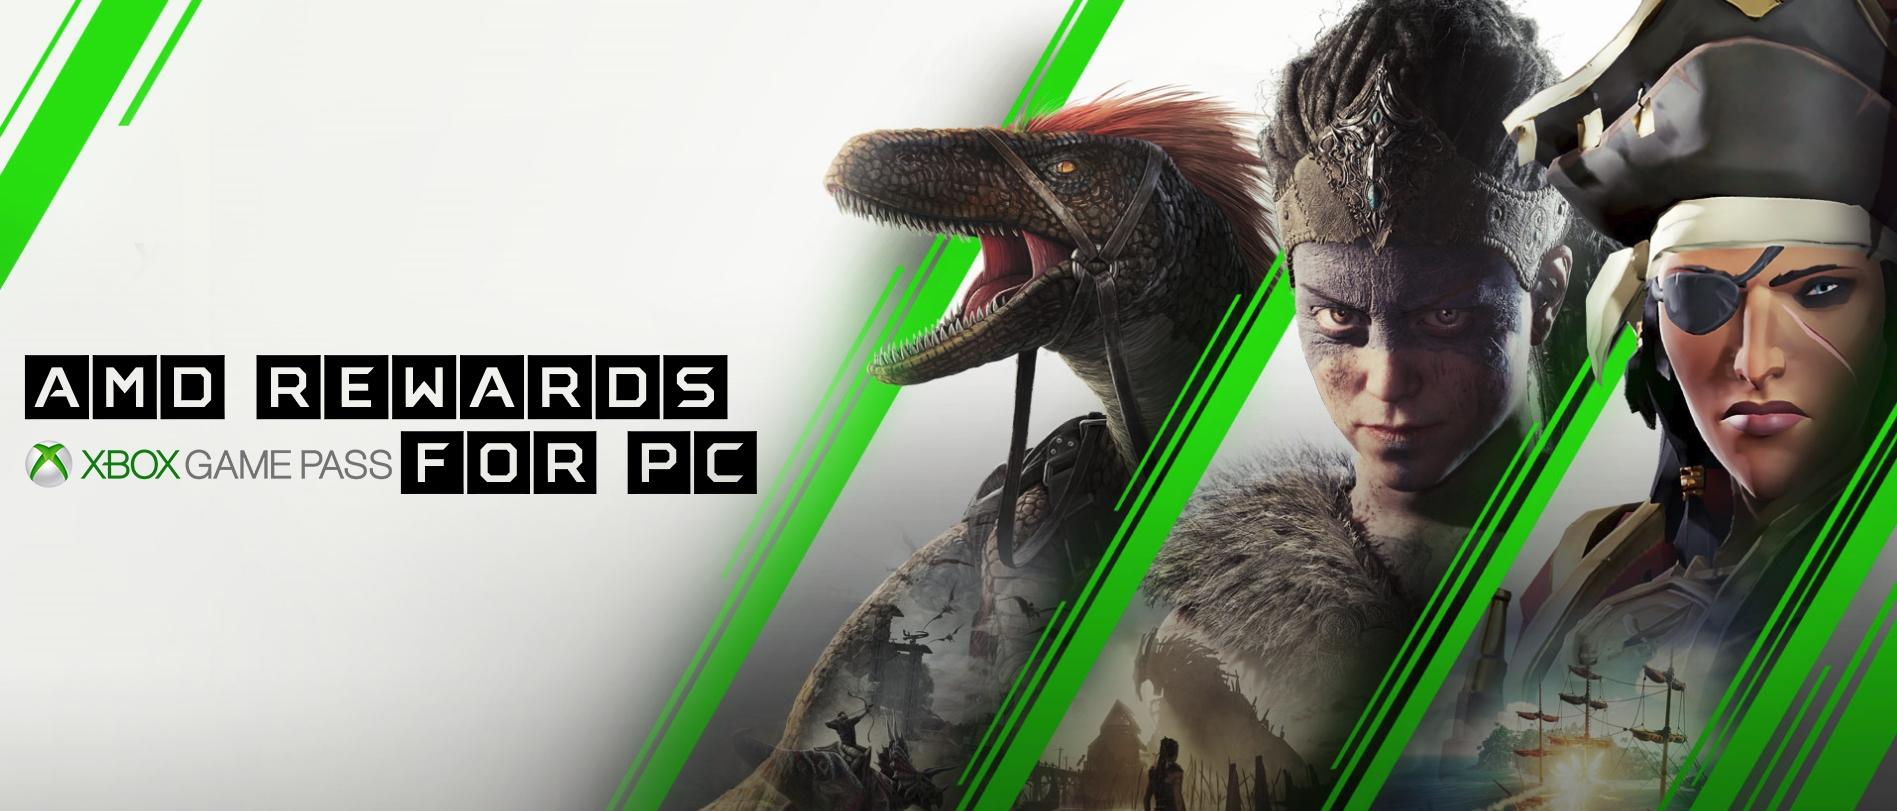 AMD REWARDS – Xbox Game Pass for PC BONUS! | GGPC